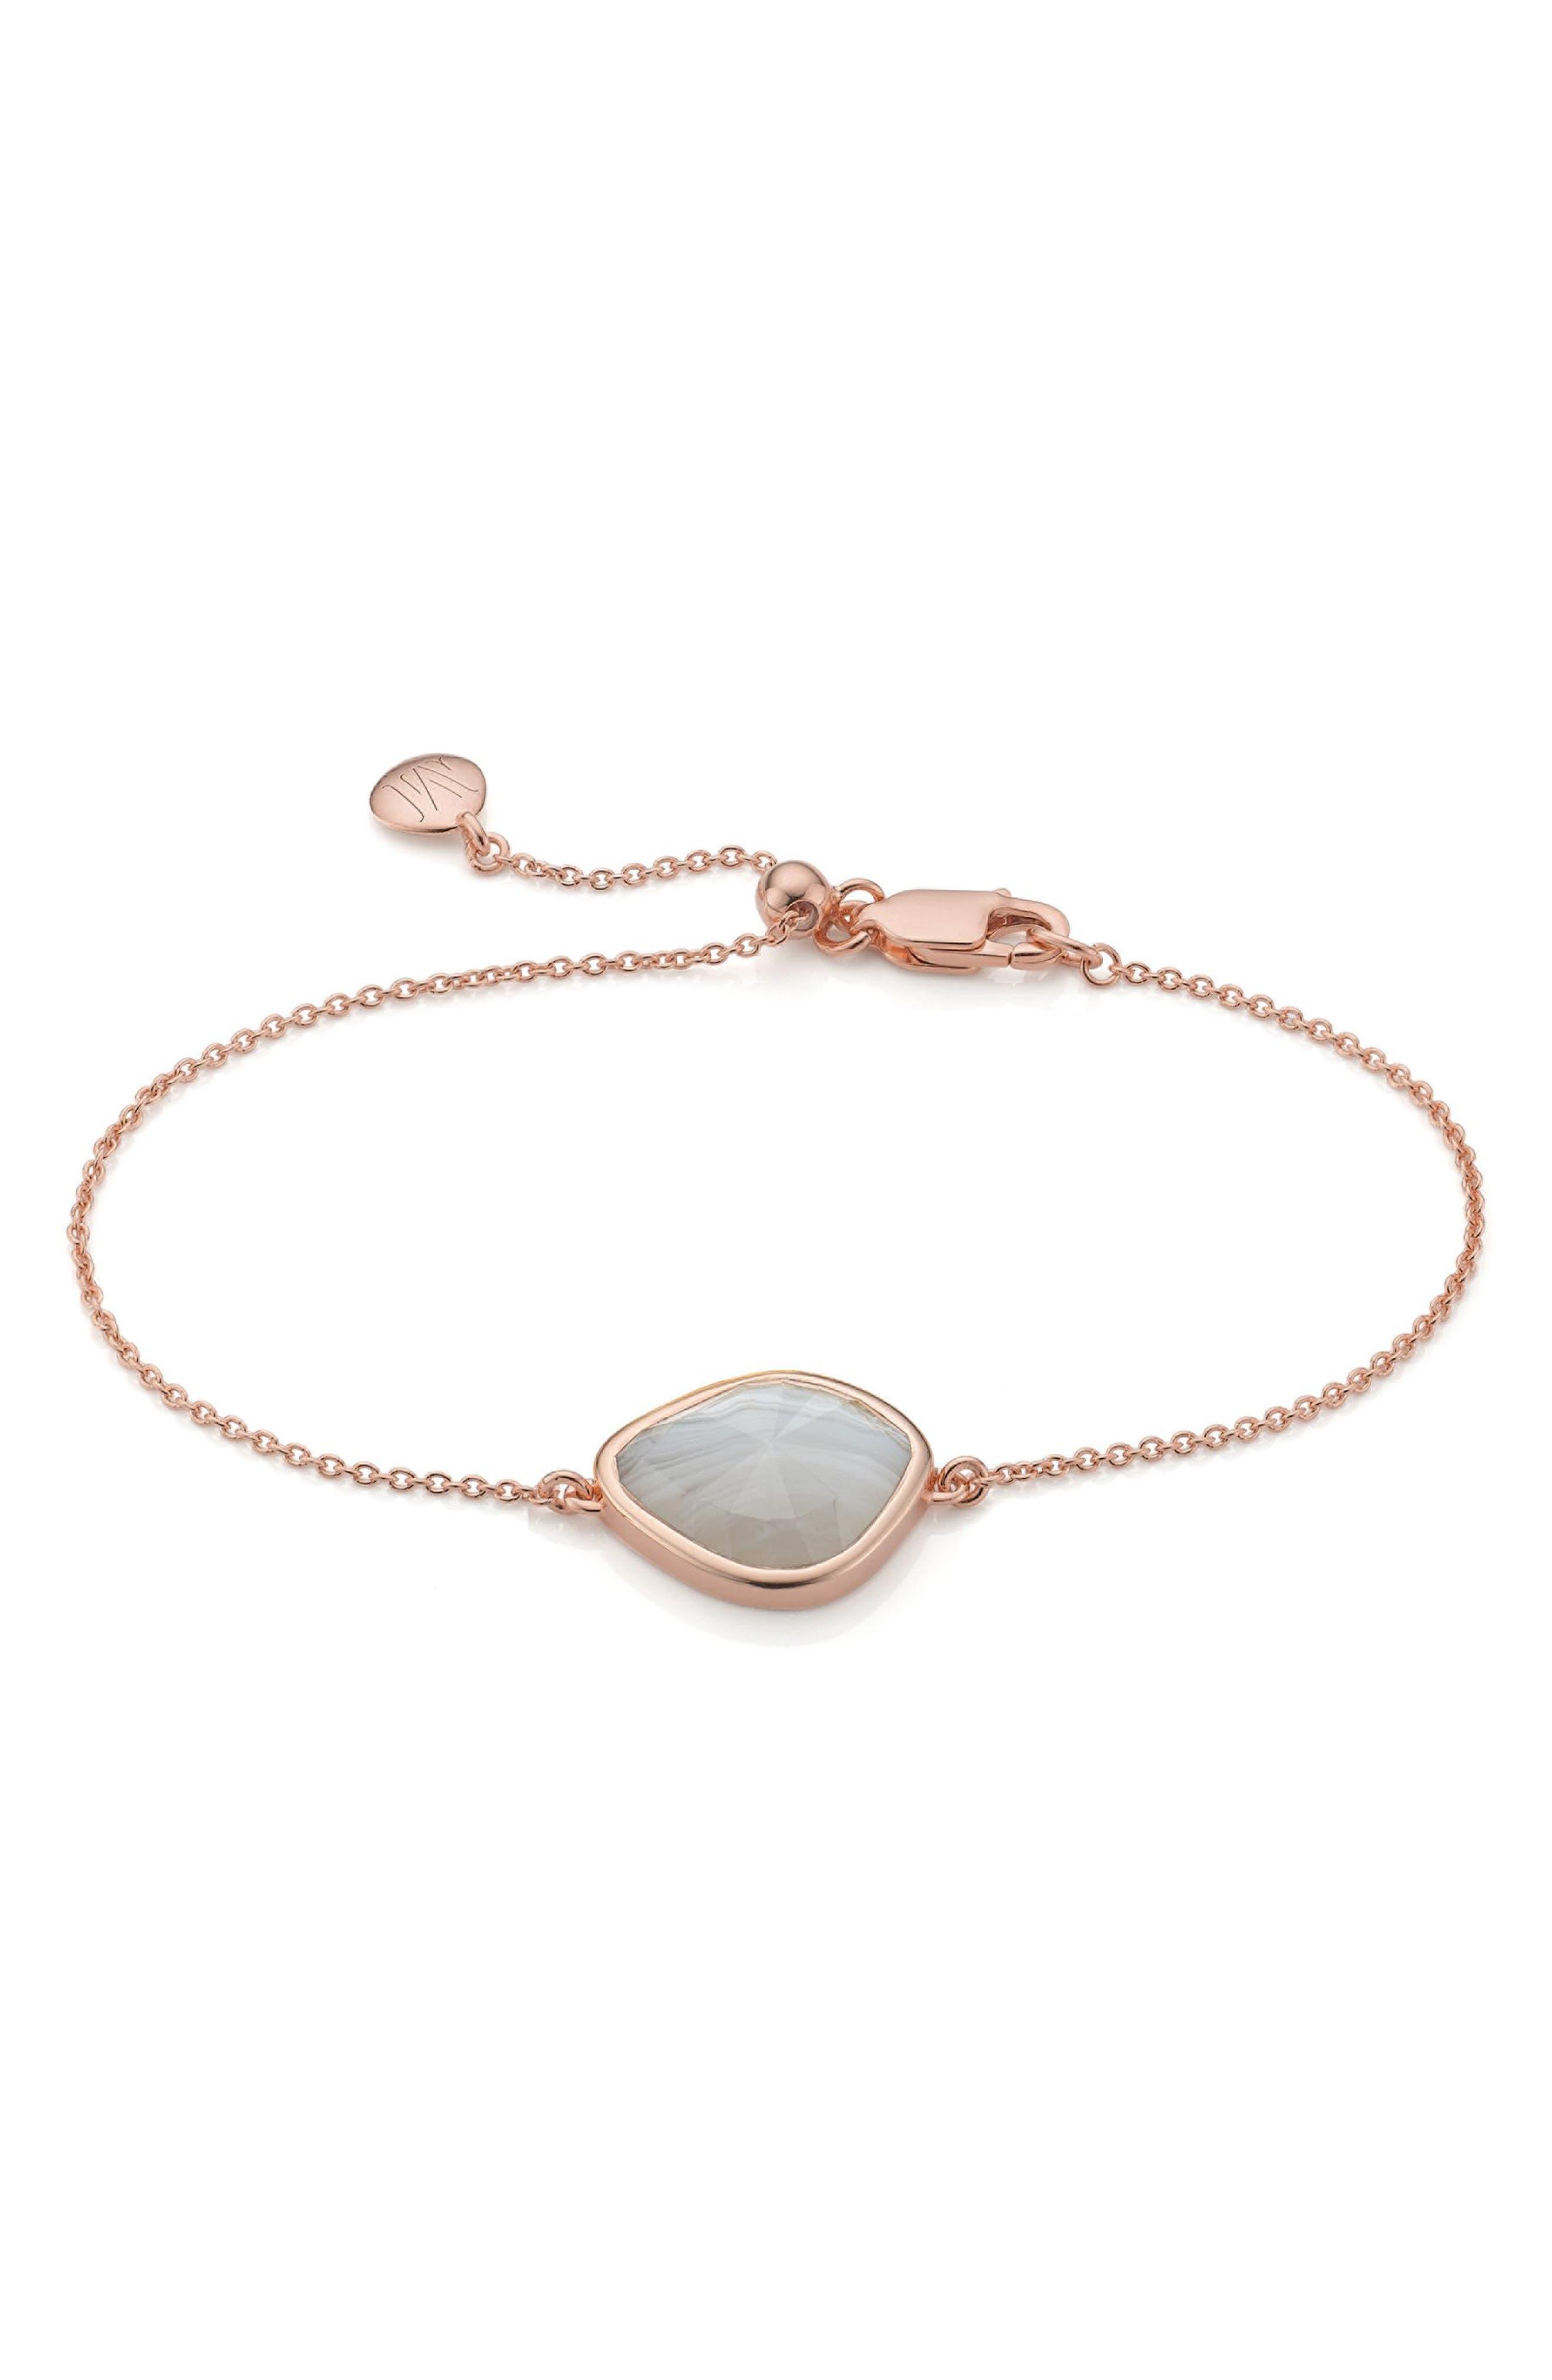 Siren Nugget Bracelet,                             Main thumbnail 1, color,                             GREY AGATE/ ROSE GOLD